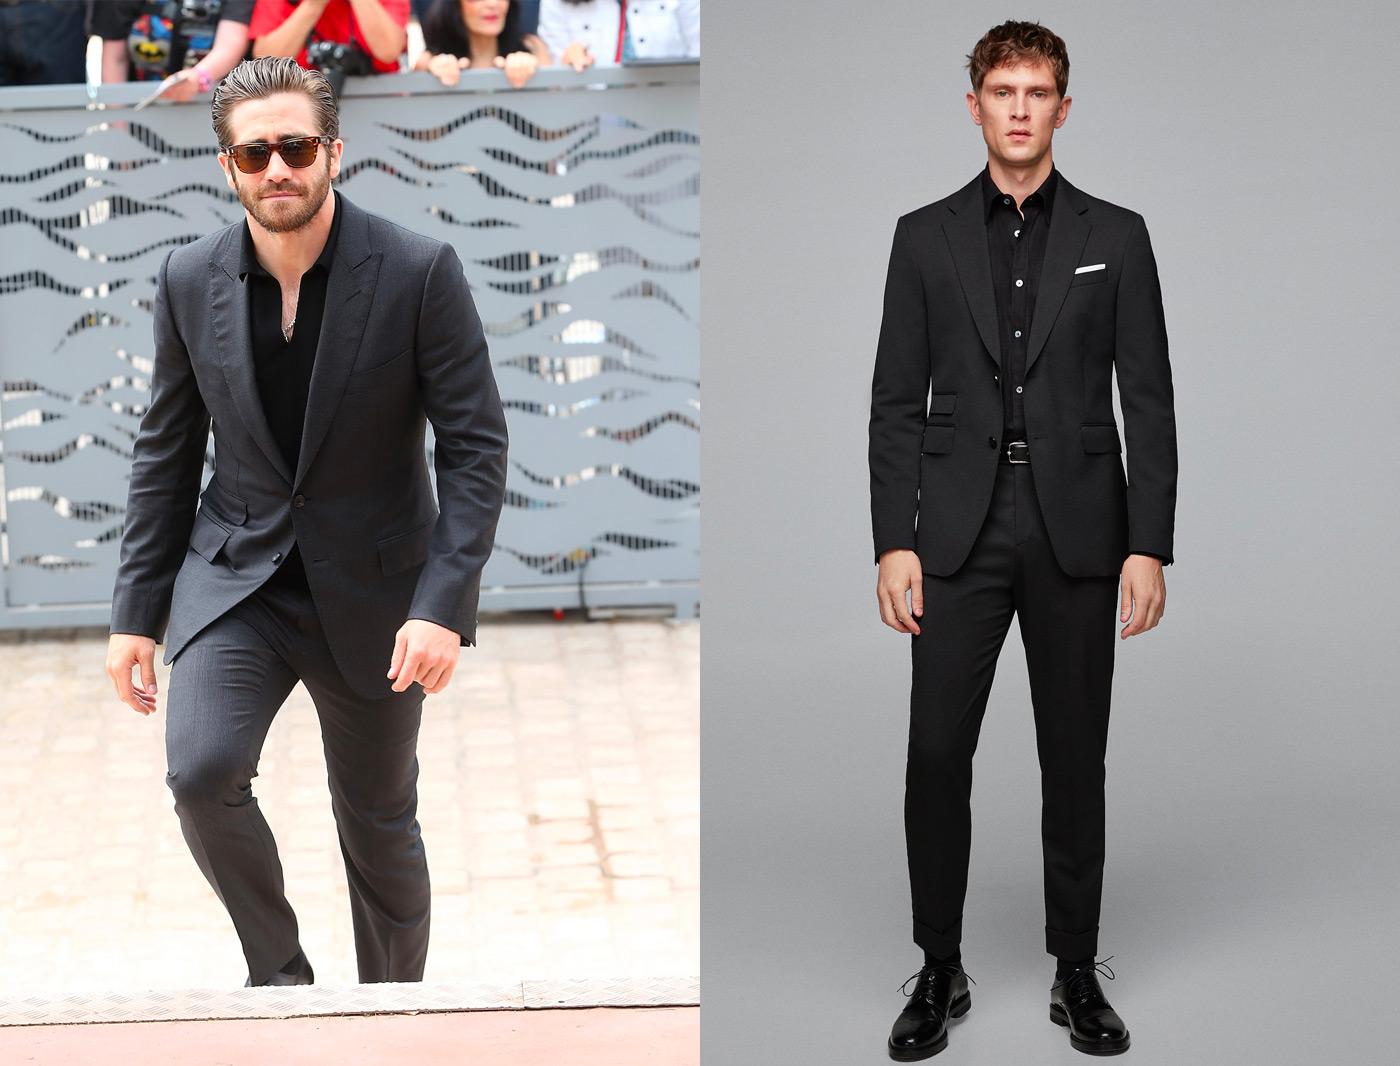 50 Ways To Wear A Black Suit - Modern